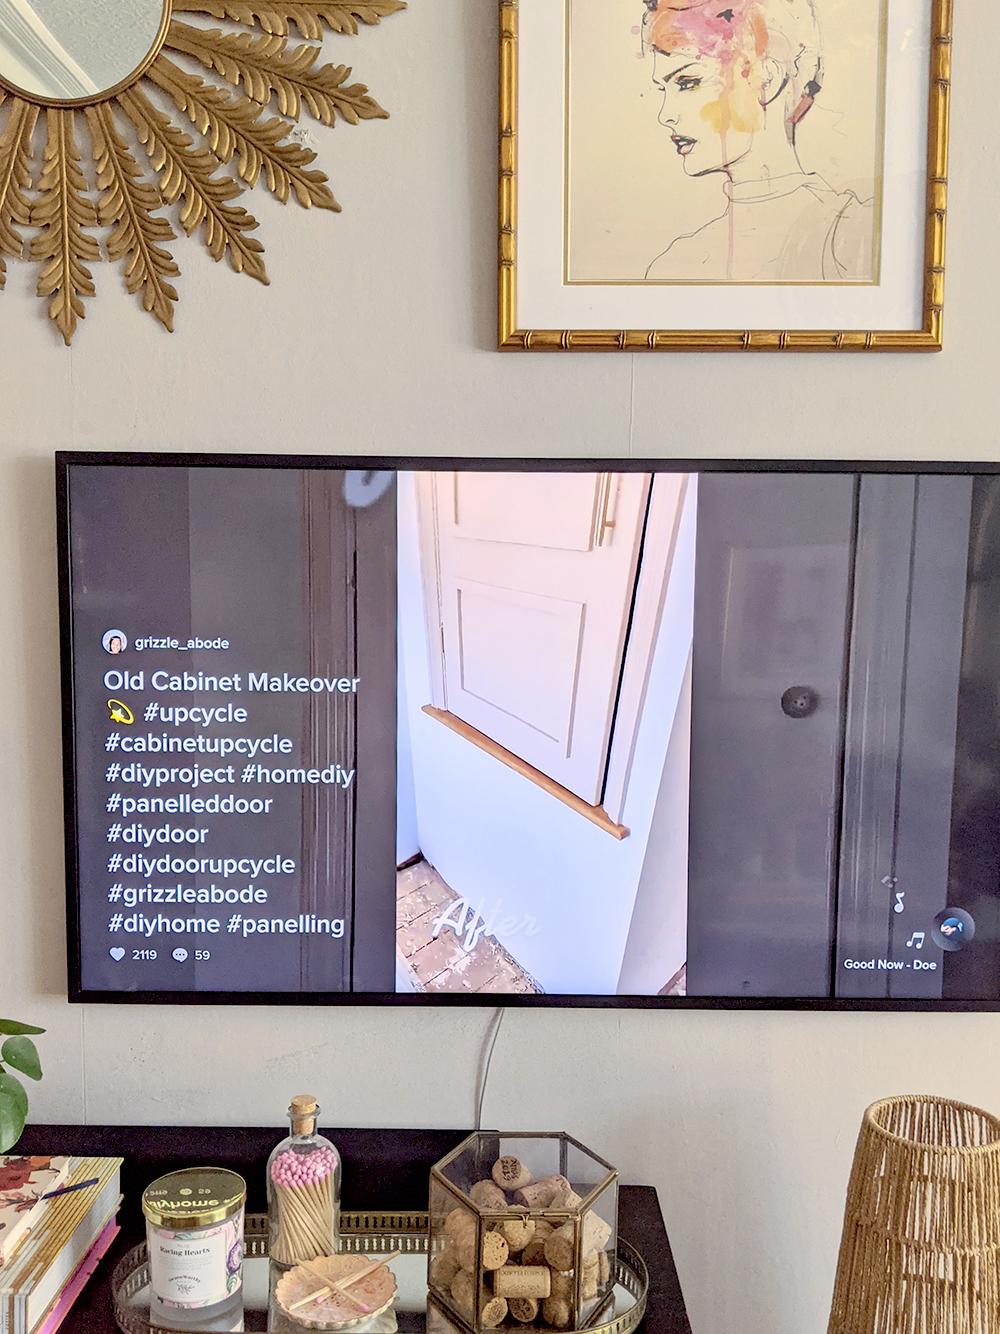 Samsung Frame TV 2021 Watching TikTok app